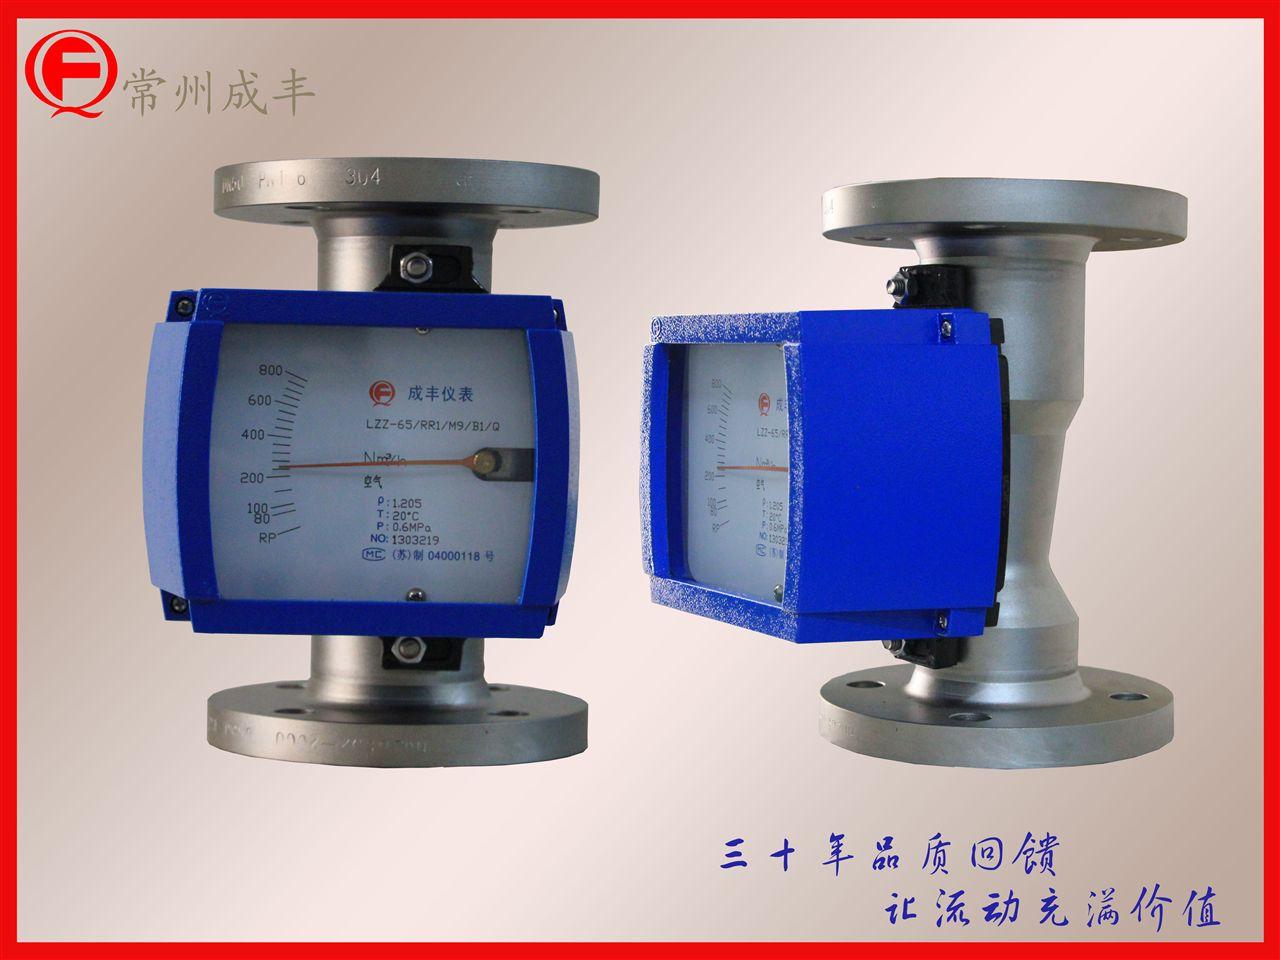 LZZ-15-【常州成丰】第三代金属管浮子流量计,国产质量Z好品种Z全,服务Z优。